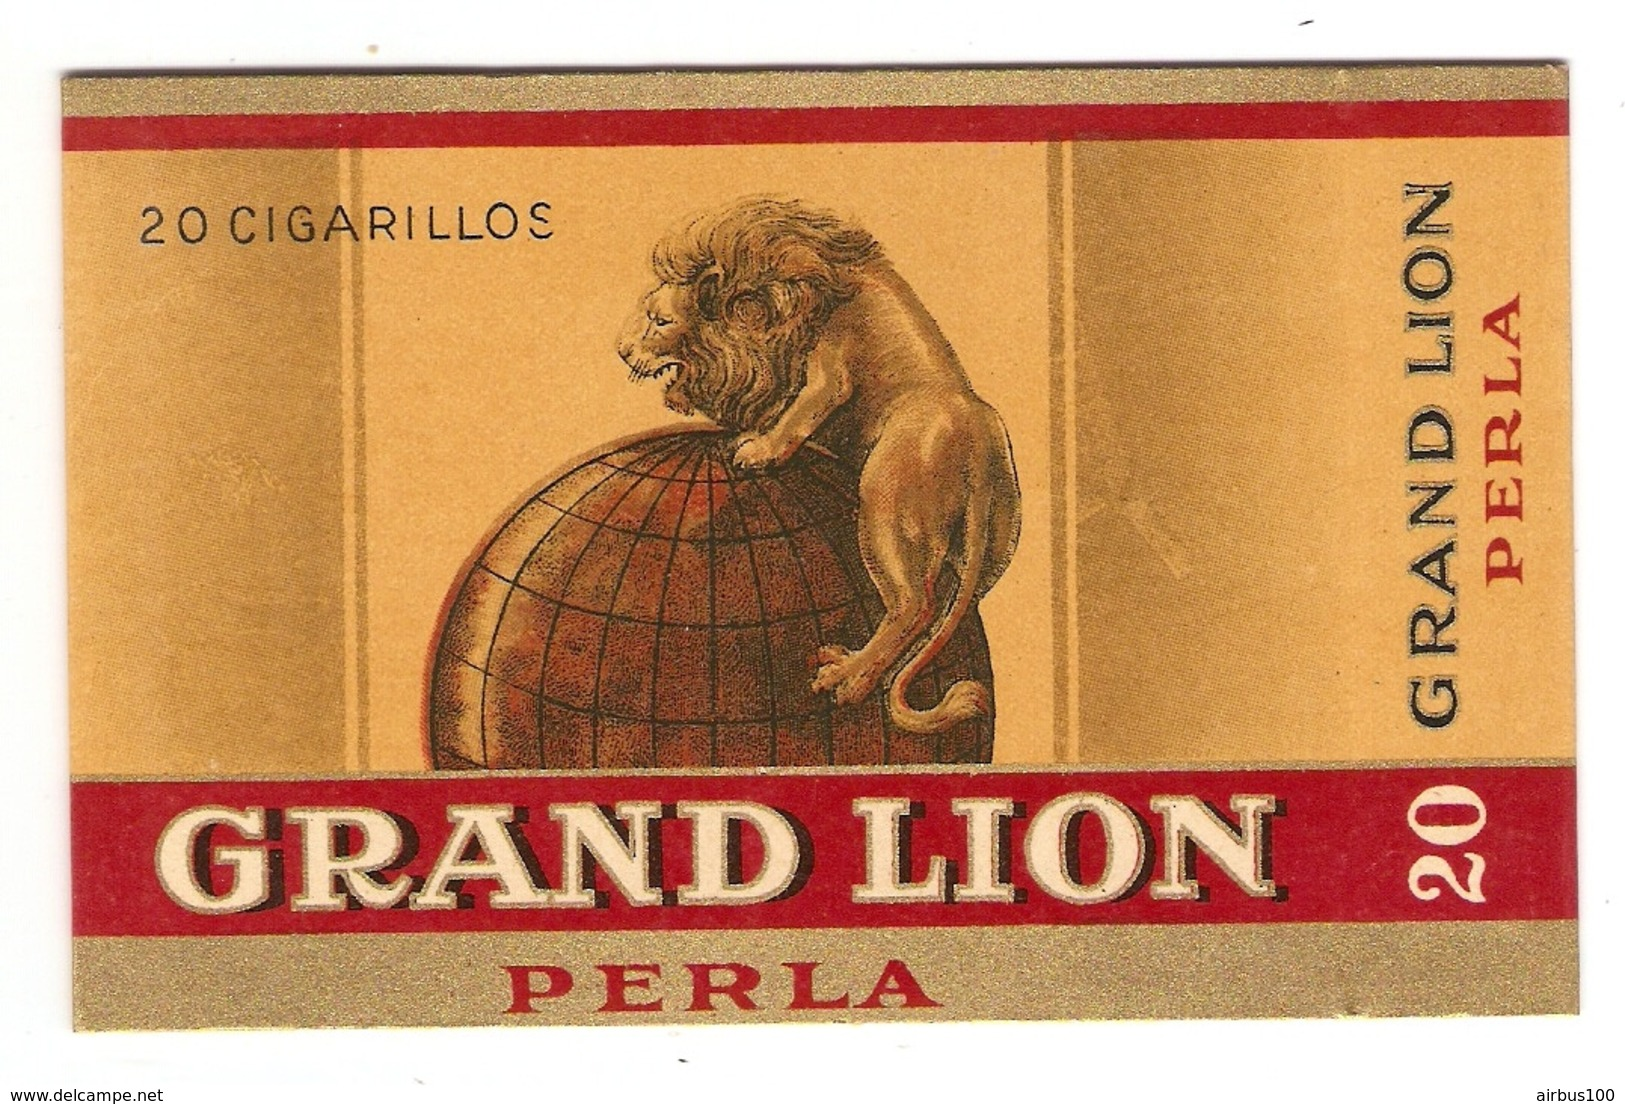 ETUI BOITE 20 CIGARILLOS GRAND LION PERLA - TABAC - TABACOS PRIMEROS - CIGARE - MAPPEMONDE - Zigarrenetuis